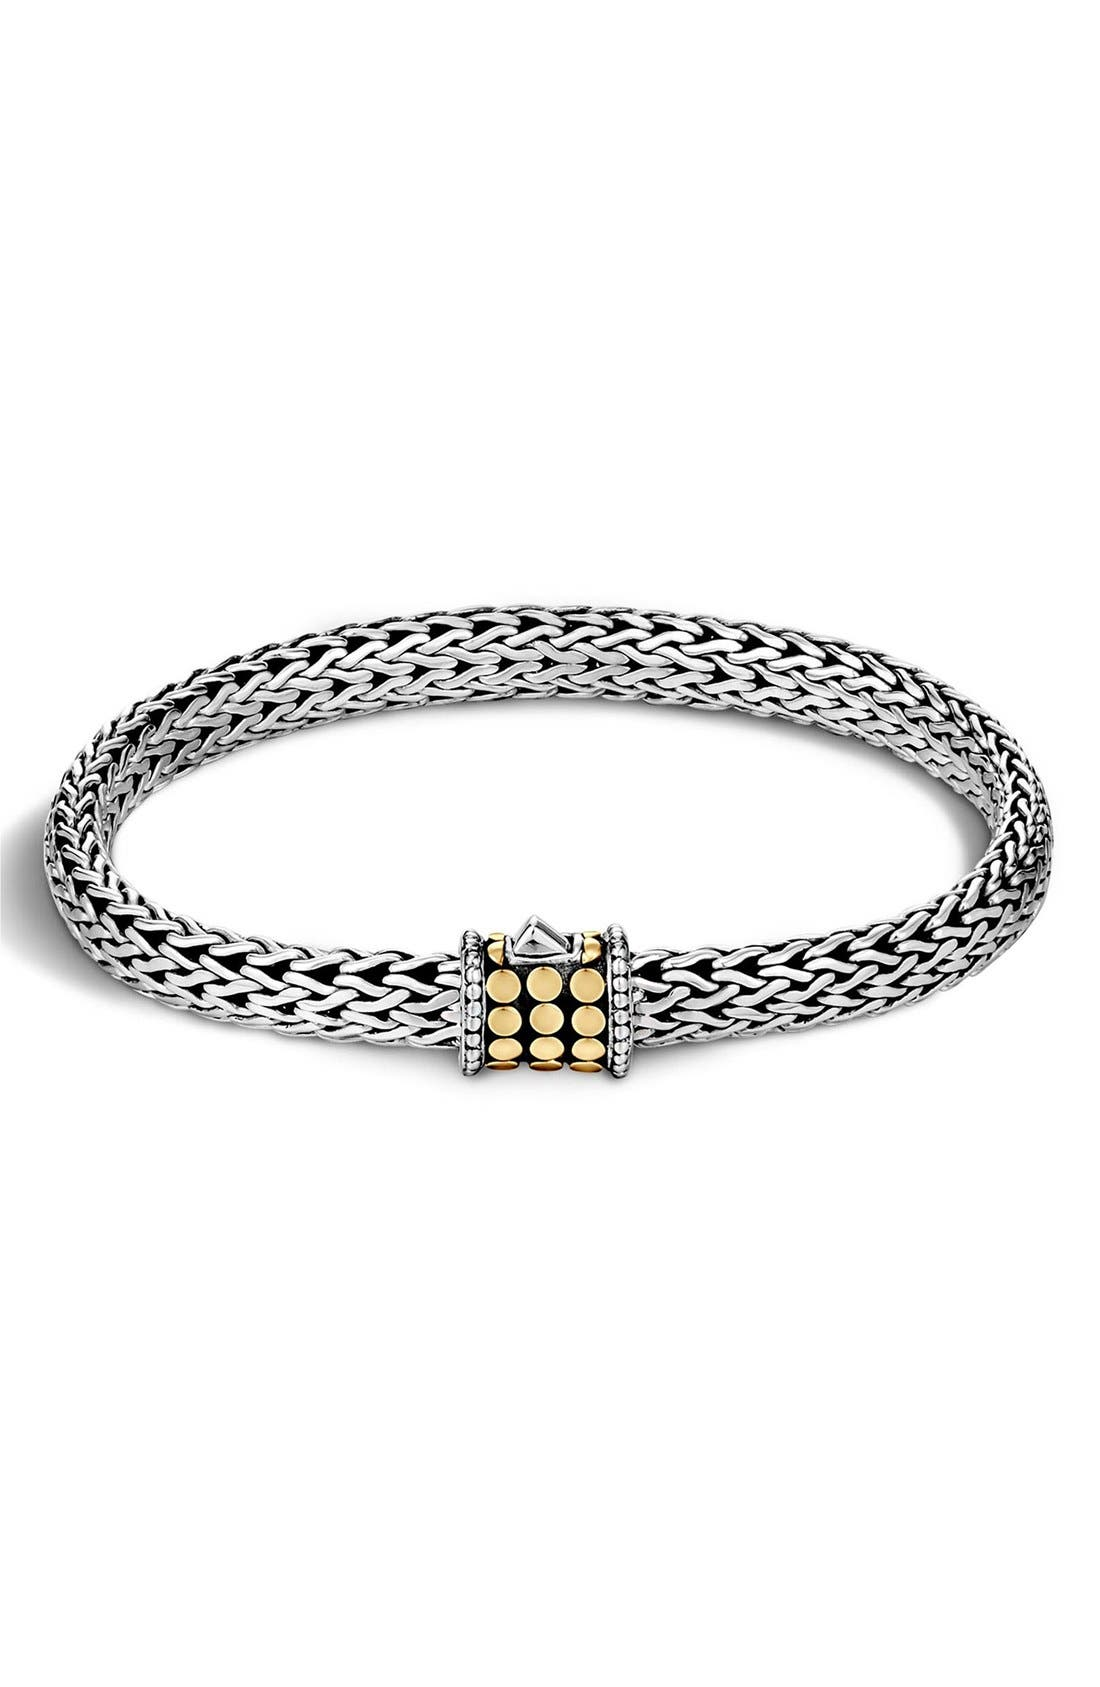 Alternate Image 1 Selected - John Hardy 'Dot' Small Bracelet